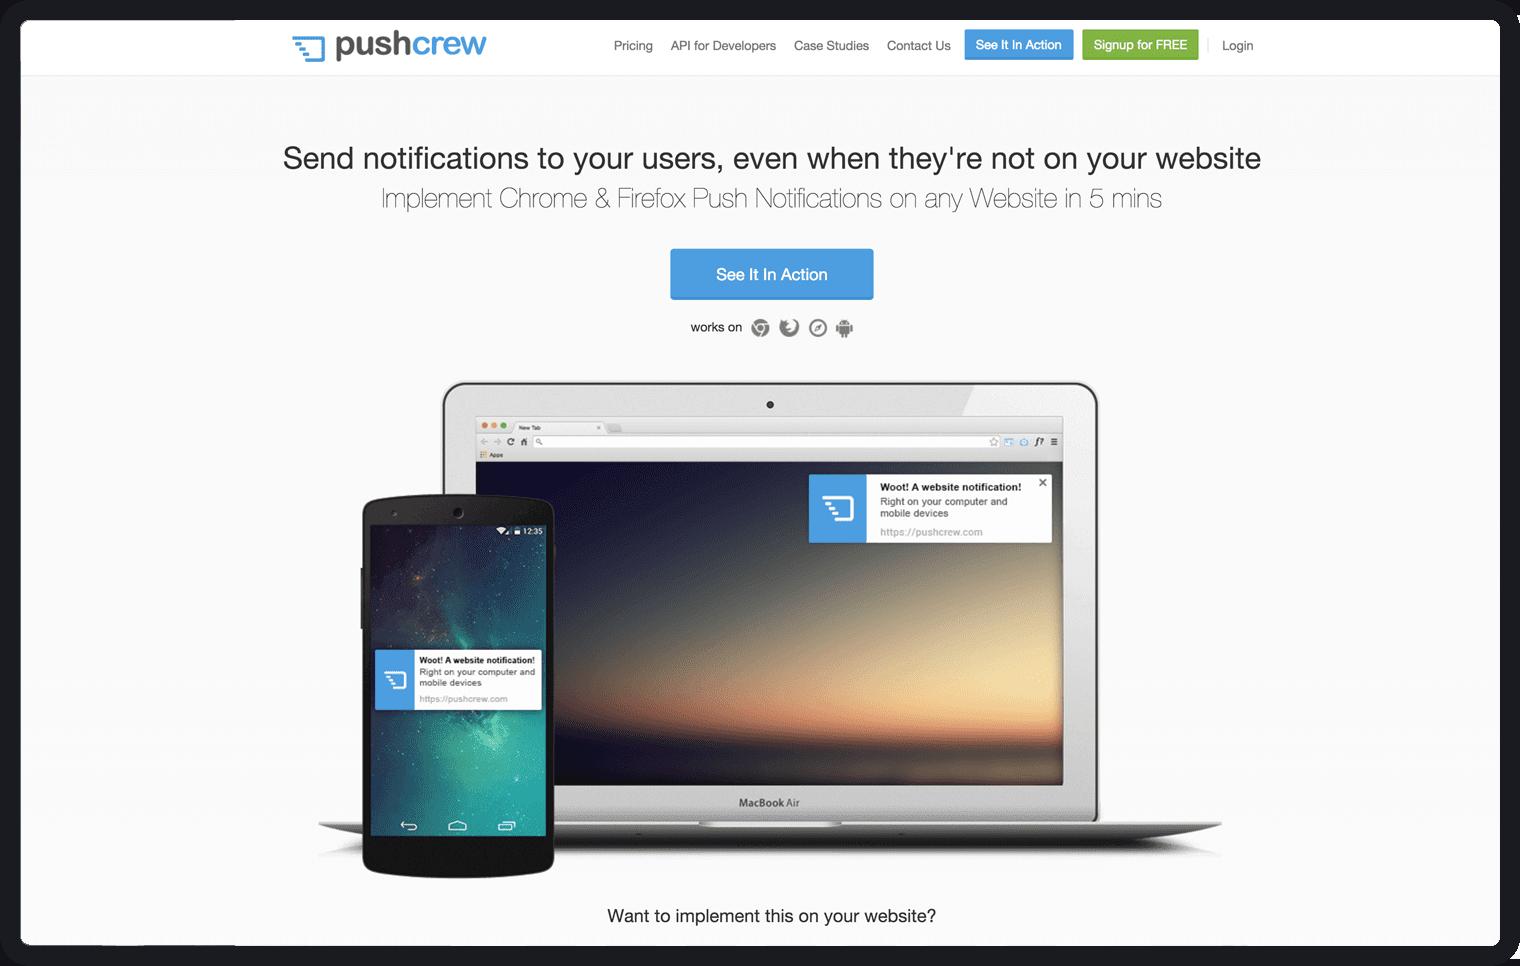 pushcrew - user onboarding tools